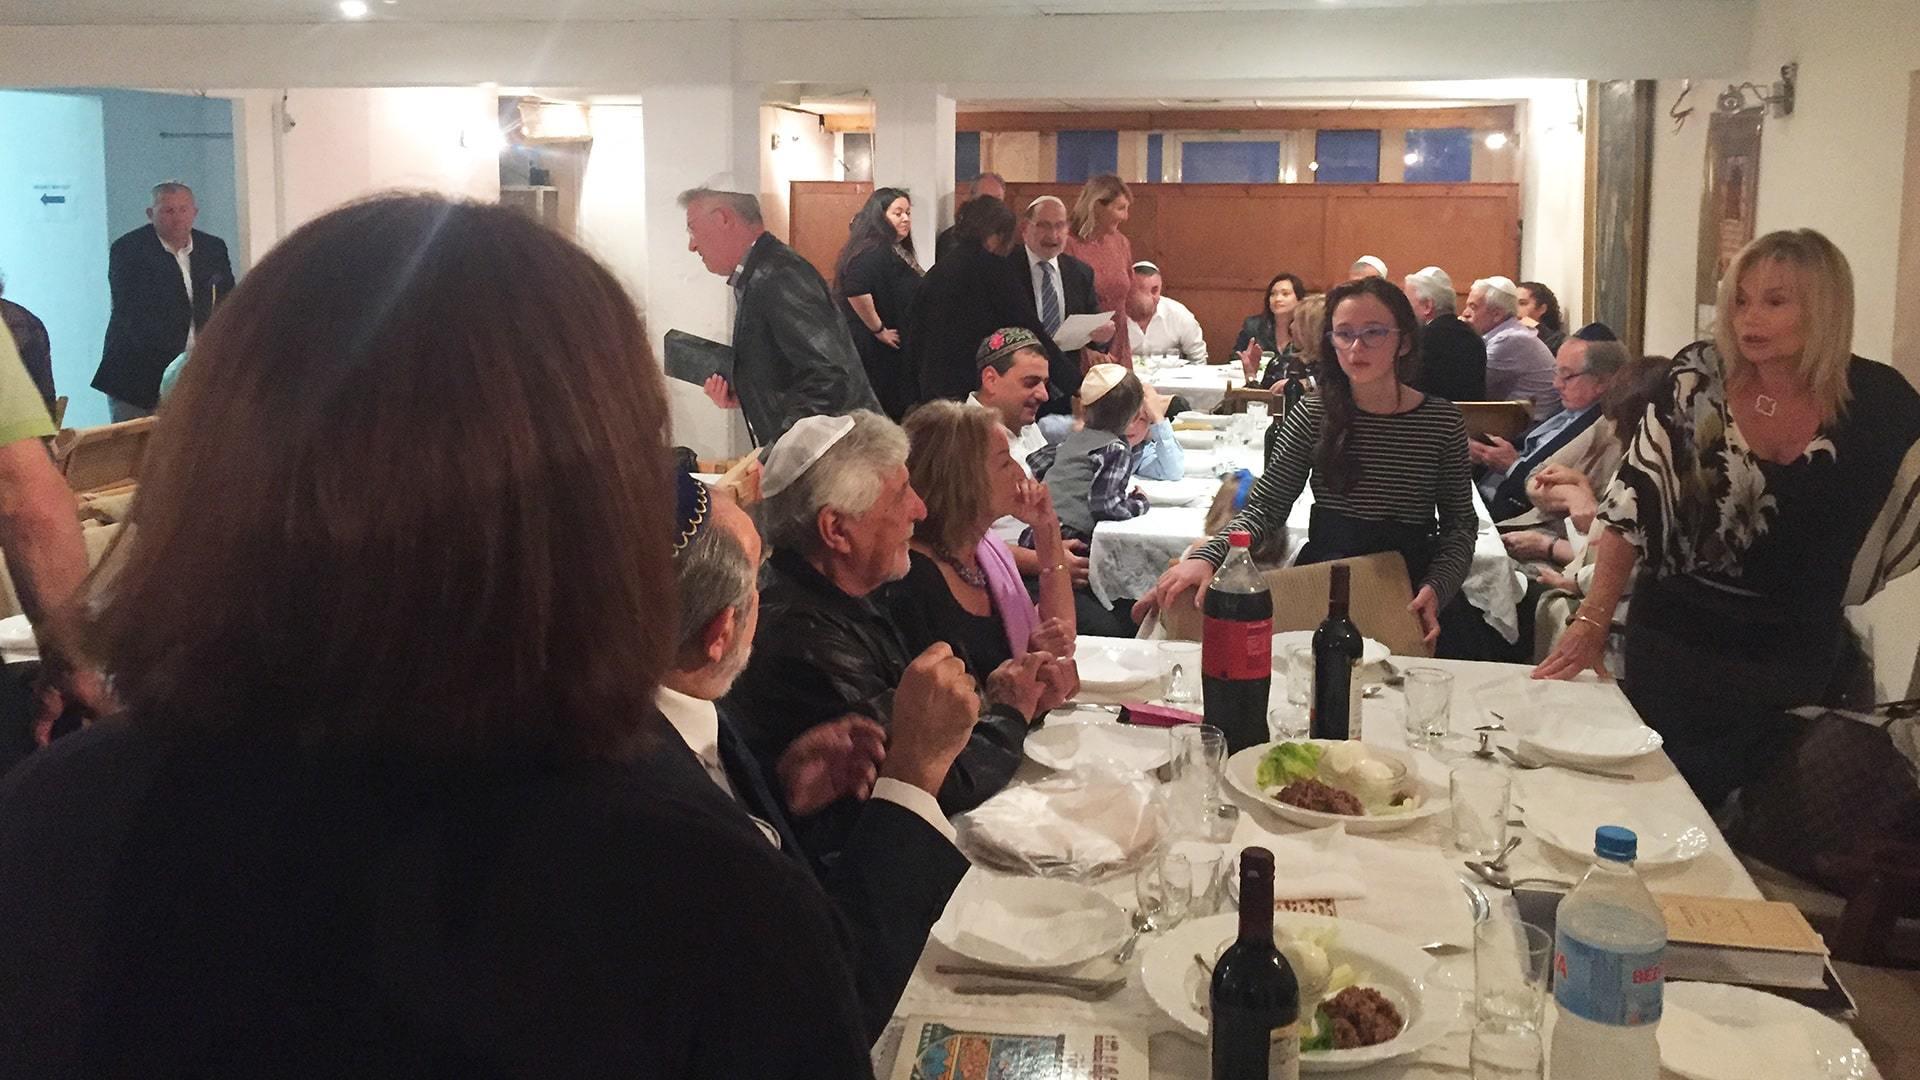 Passover Jewish celebration friends and family min